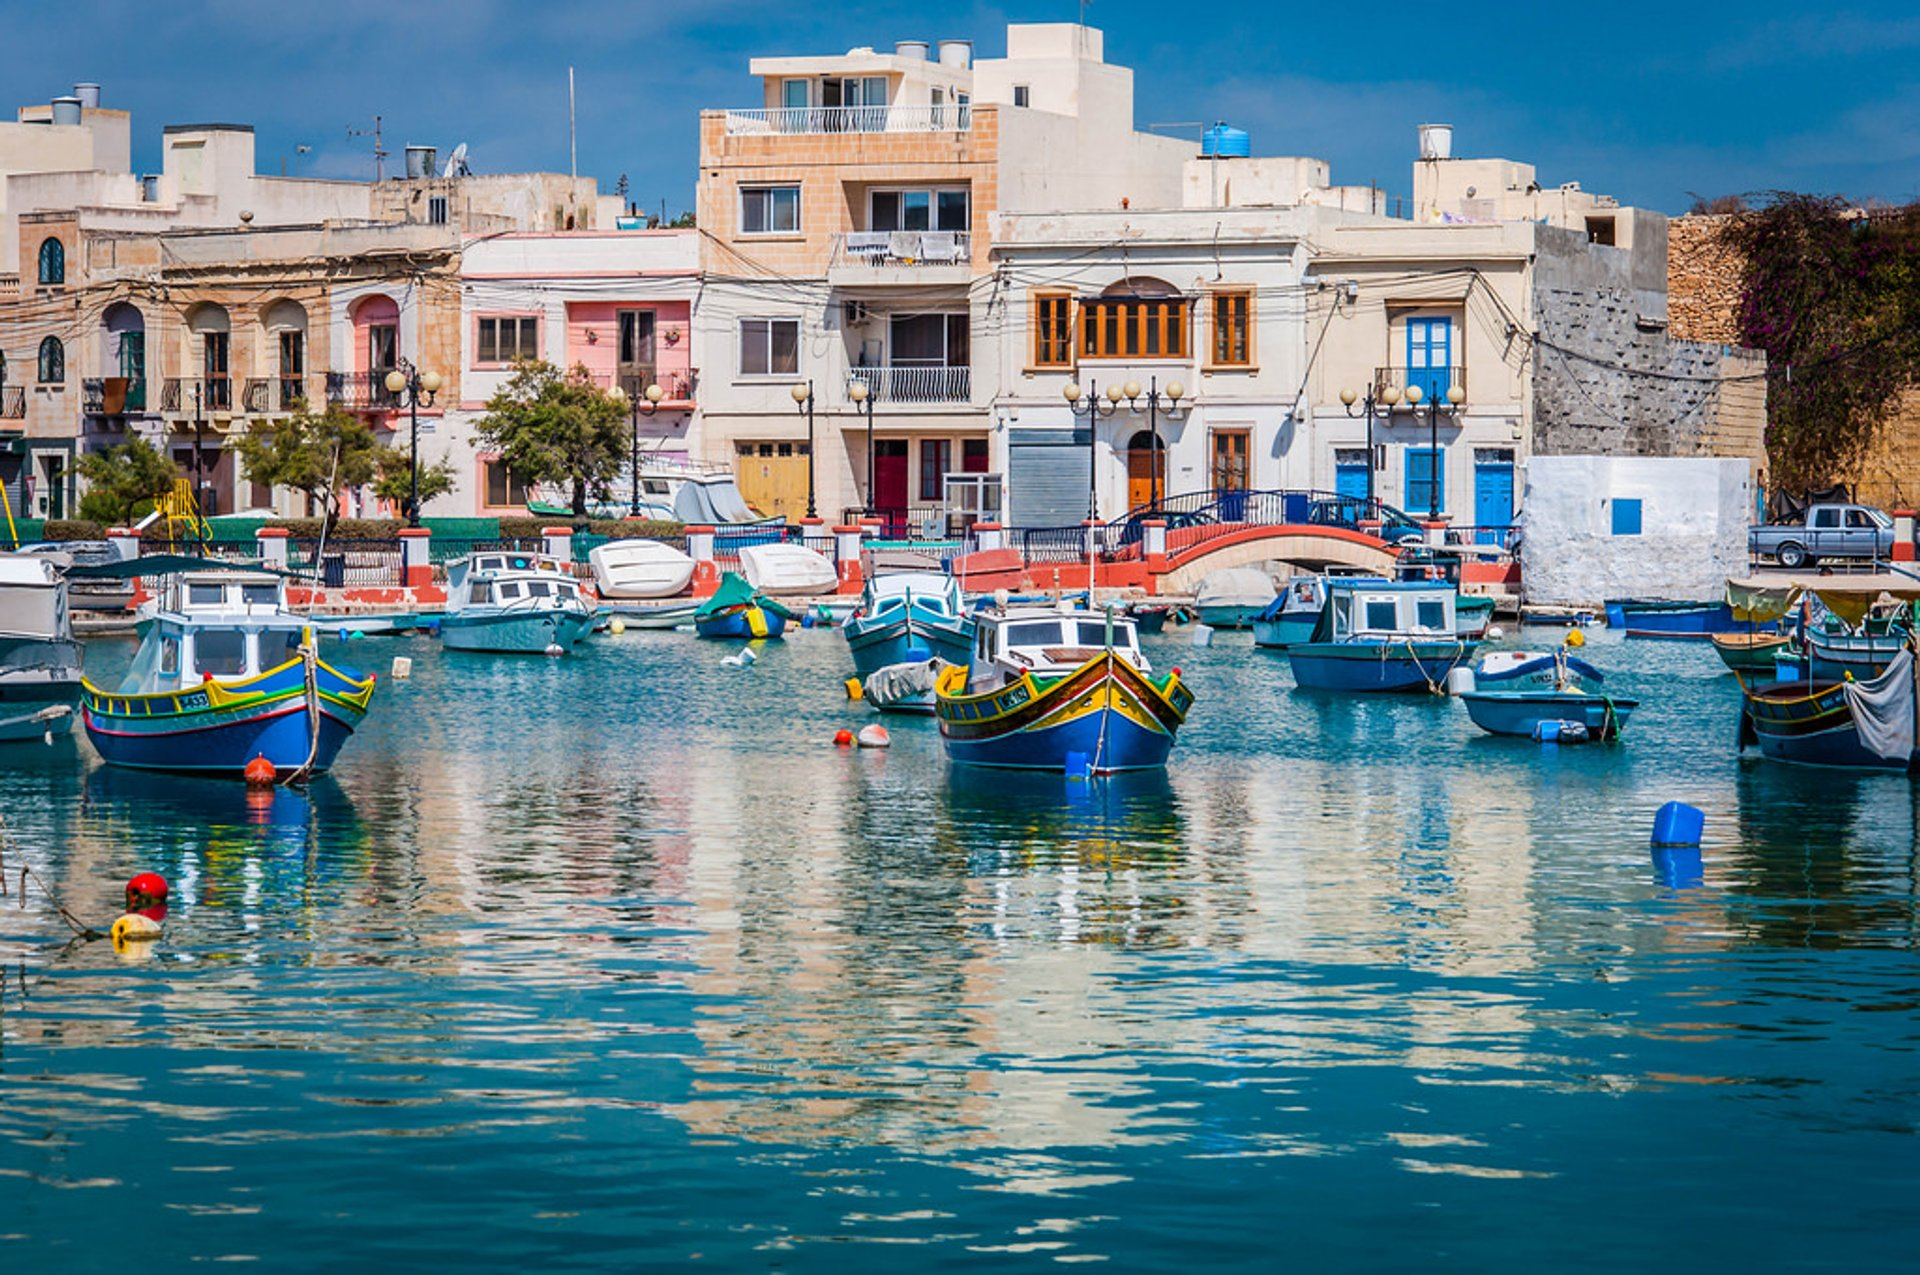 Festa Ħut (Fish Festival) in Malta - Best Season 2020